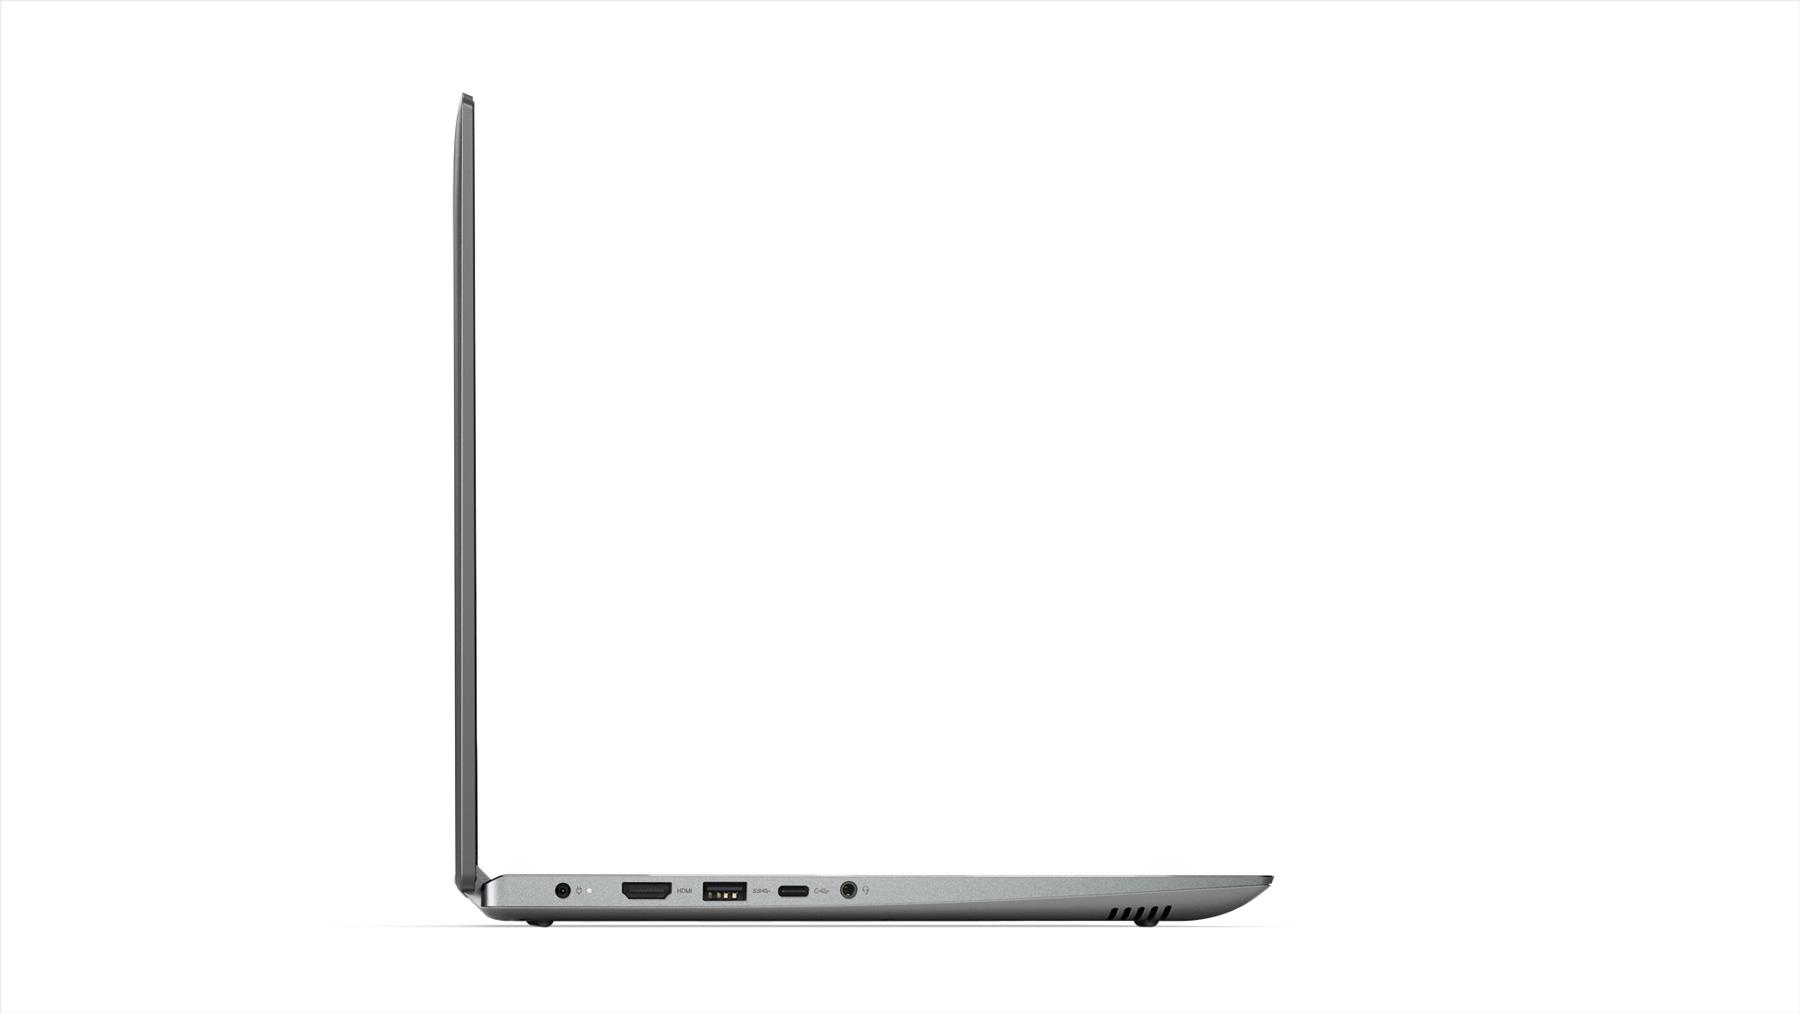 Фото  Ультрабук Lenovo Yoga 520  Mineral Grey (81C800F7RA)